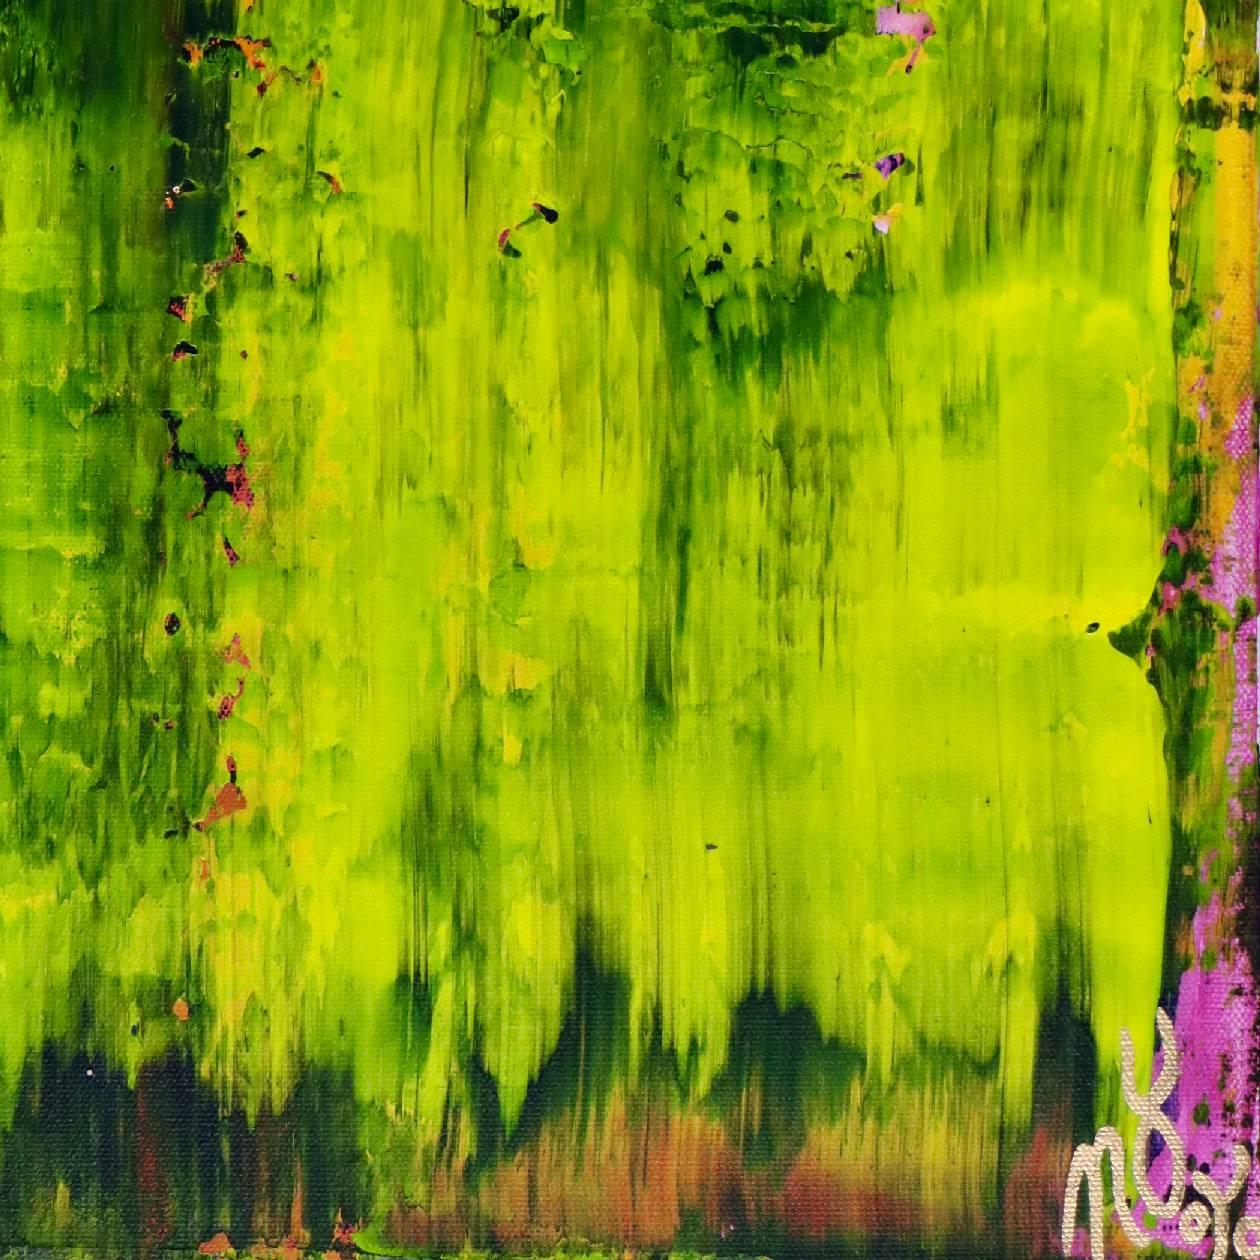 Signature - Caribbean Forest Solitude (2020) by Nestor Toro